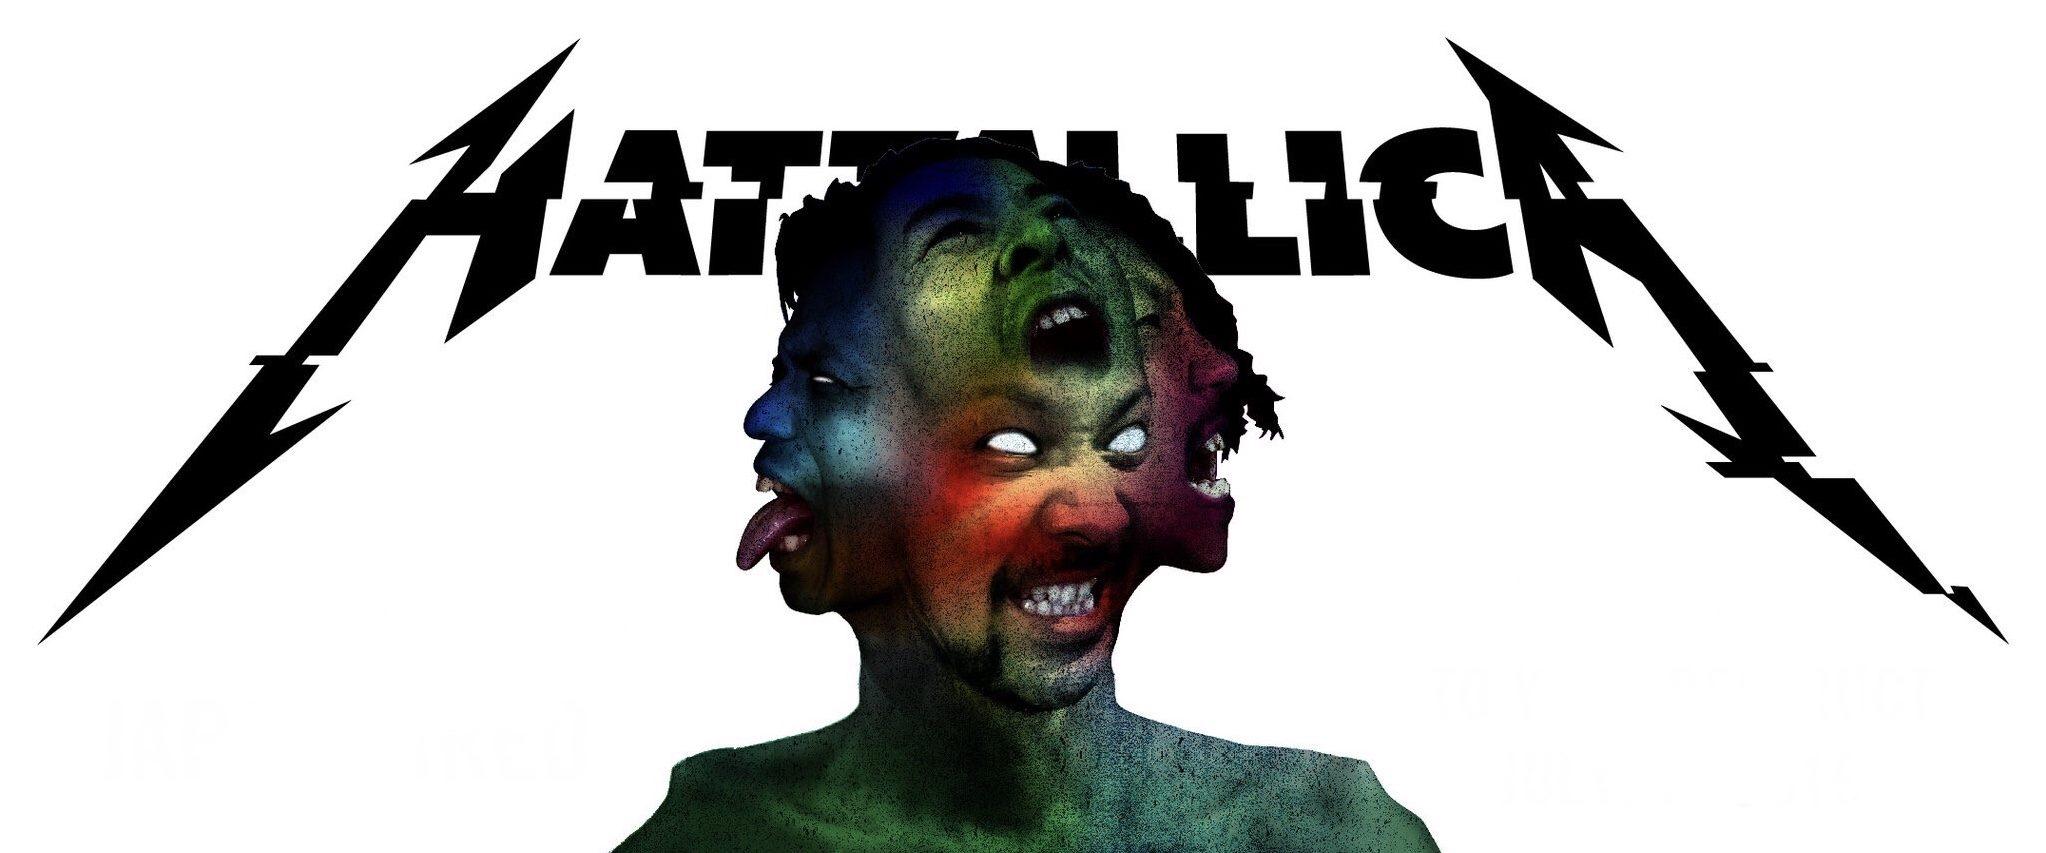 The Official HATTALLICA Website